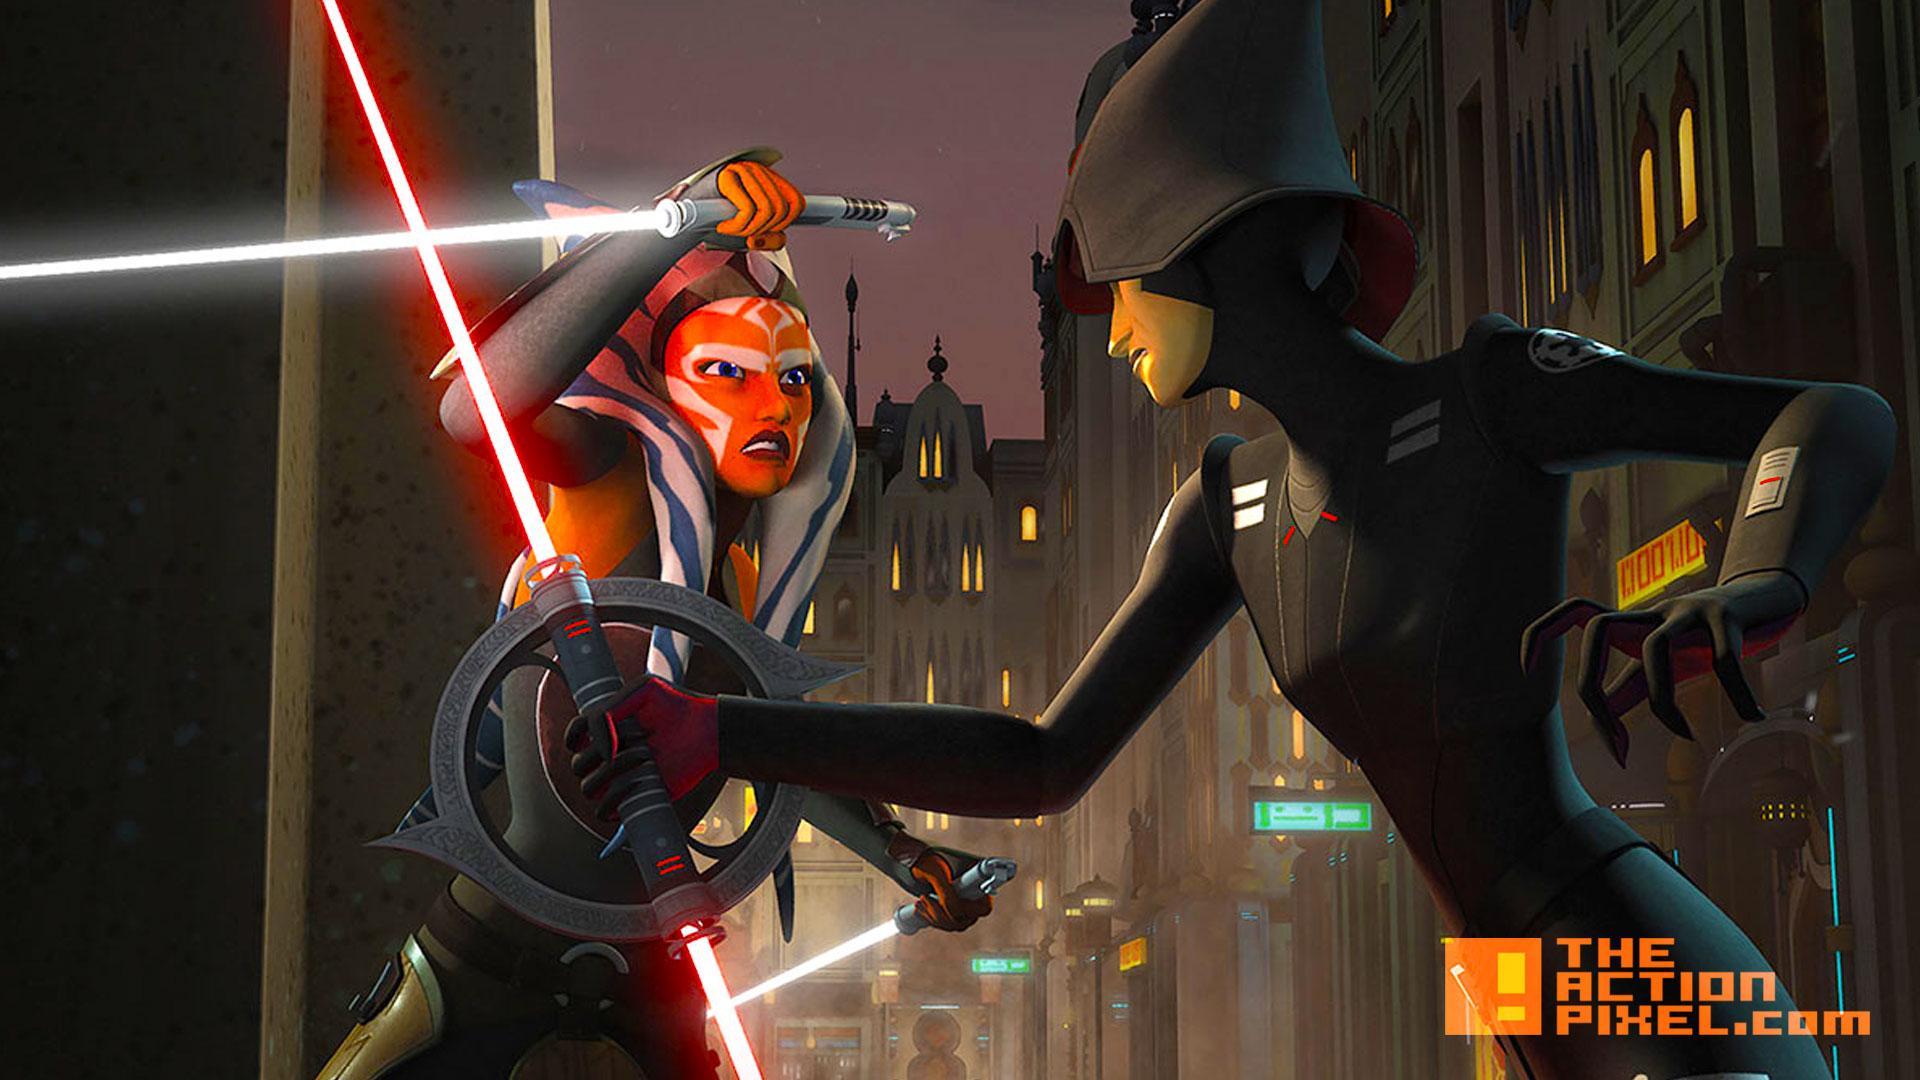 star wars rebels. the action pixel. disney xd. the action pixel. @theactionpixel